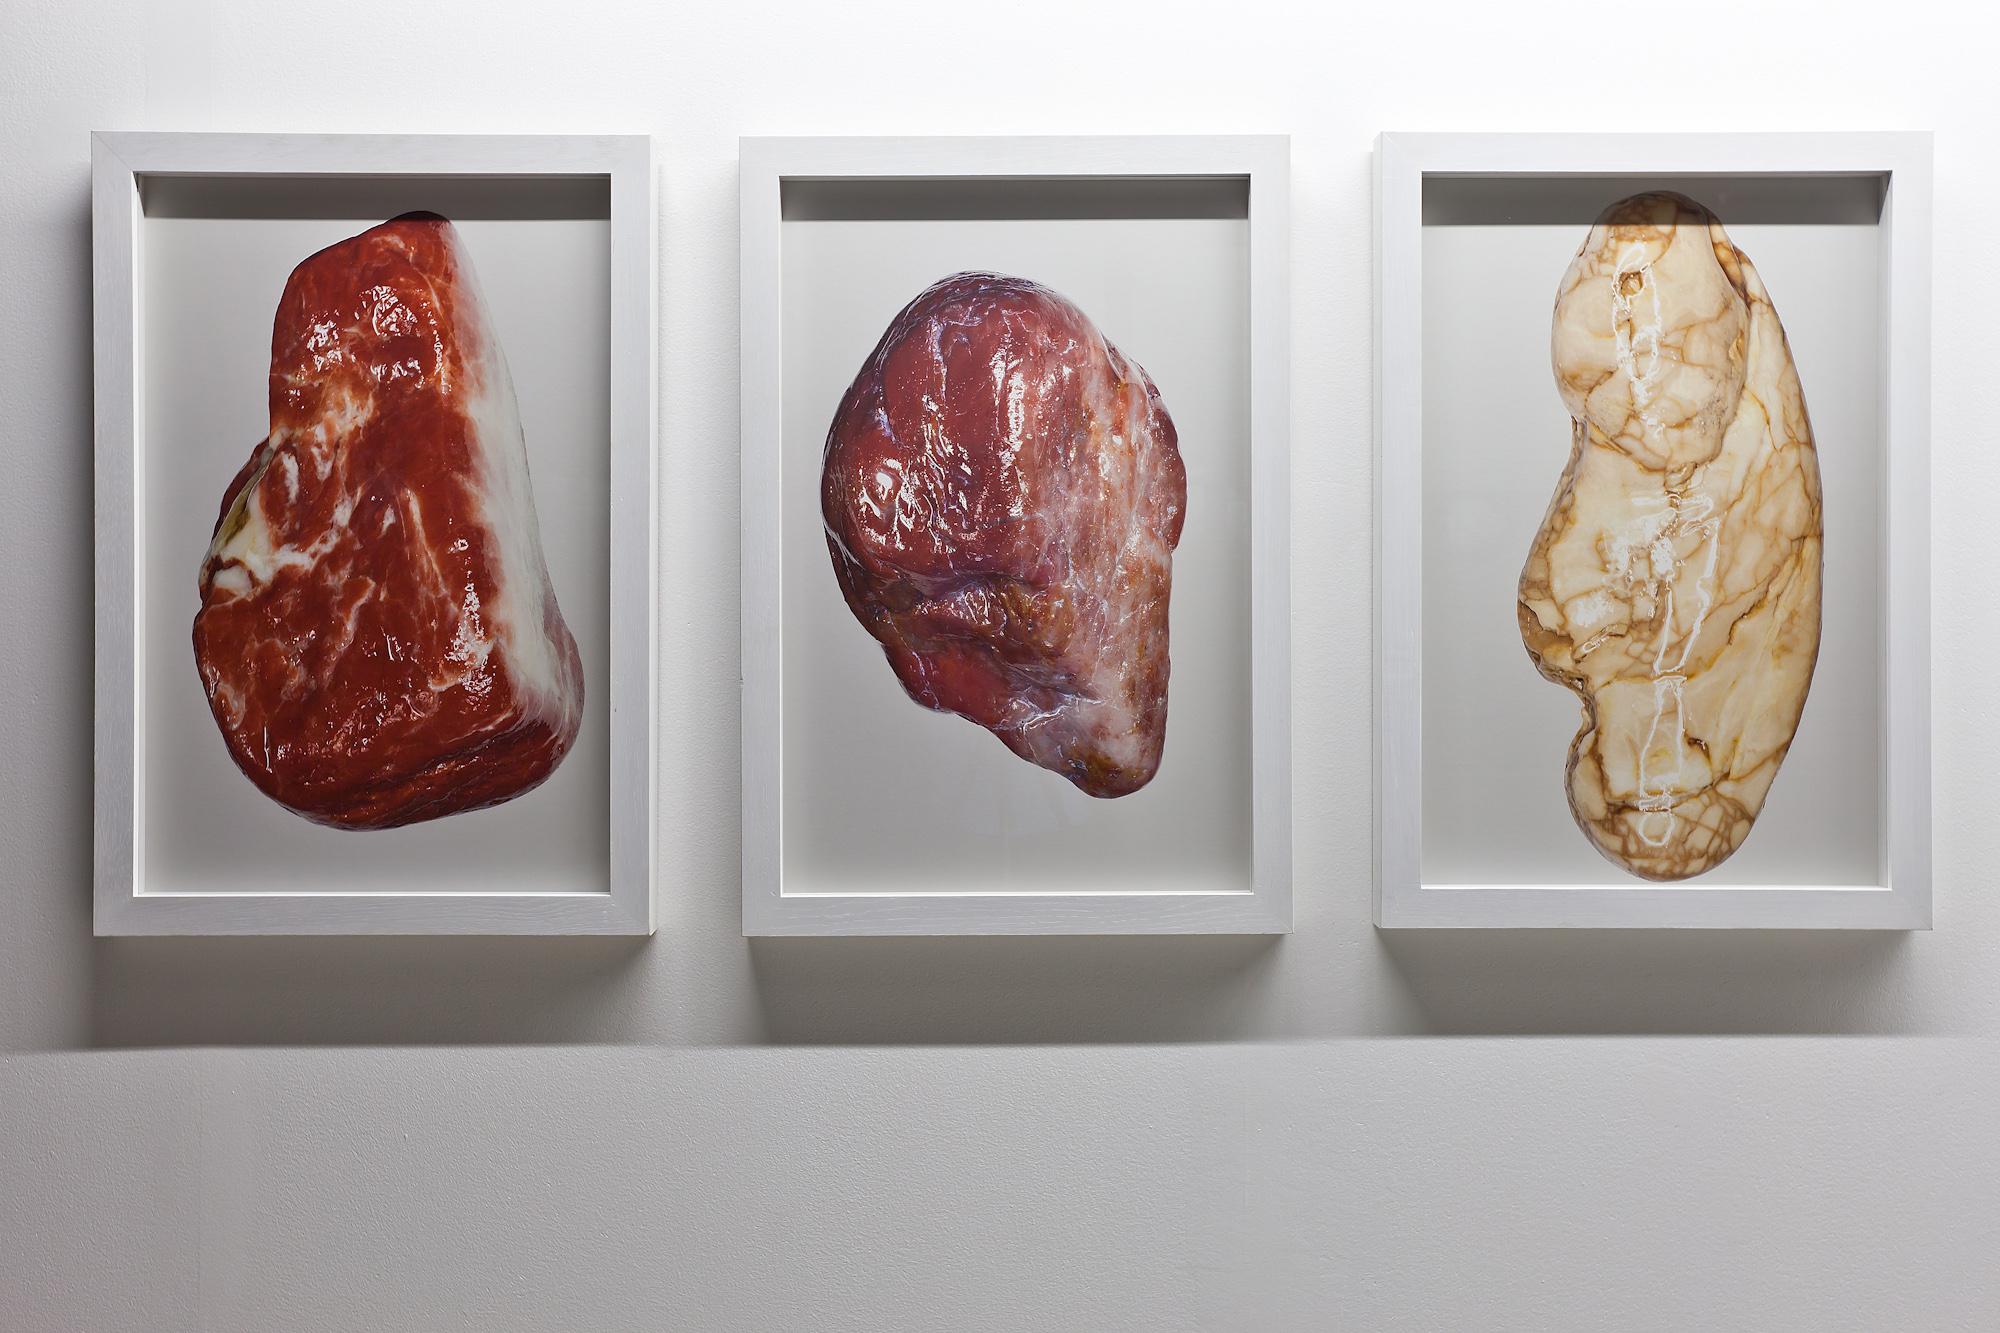 Witek Orski, Stones (triptych), 2012. Courtesy of Borowik Collection